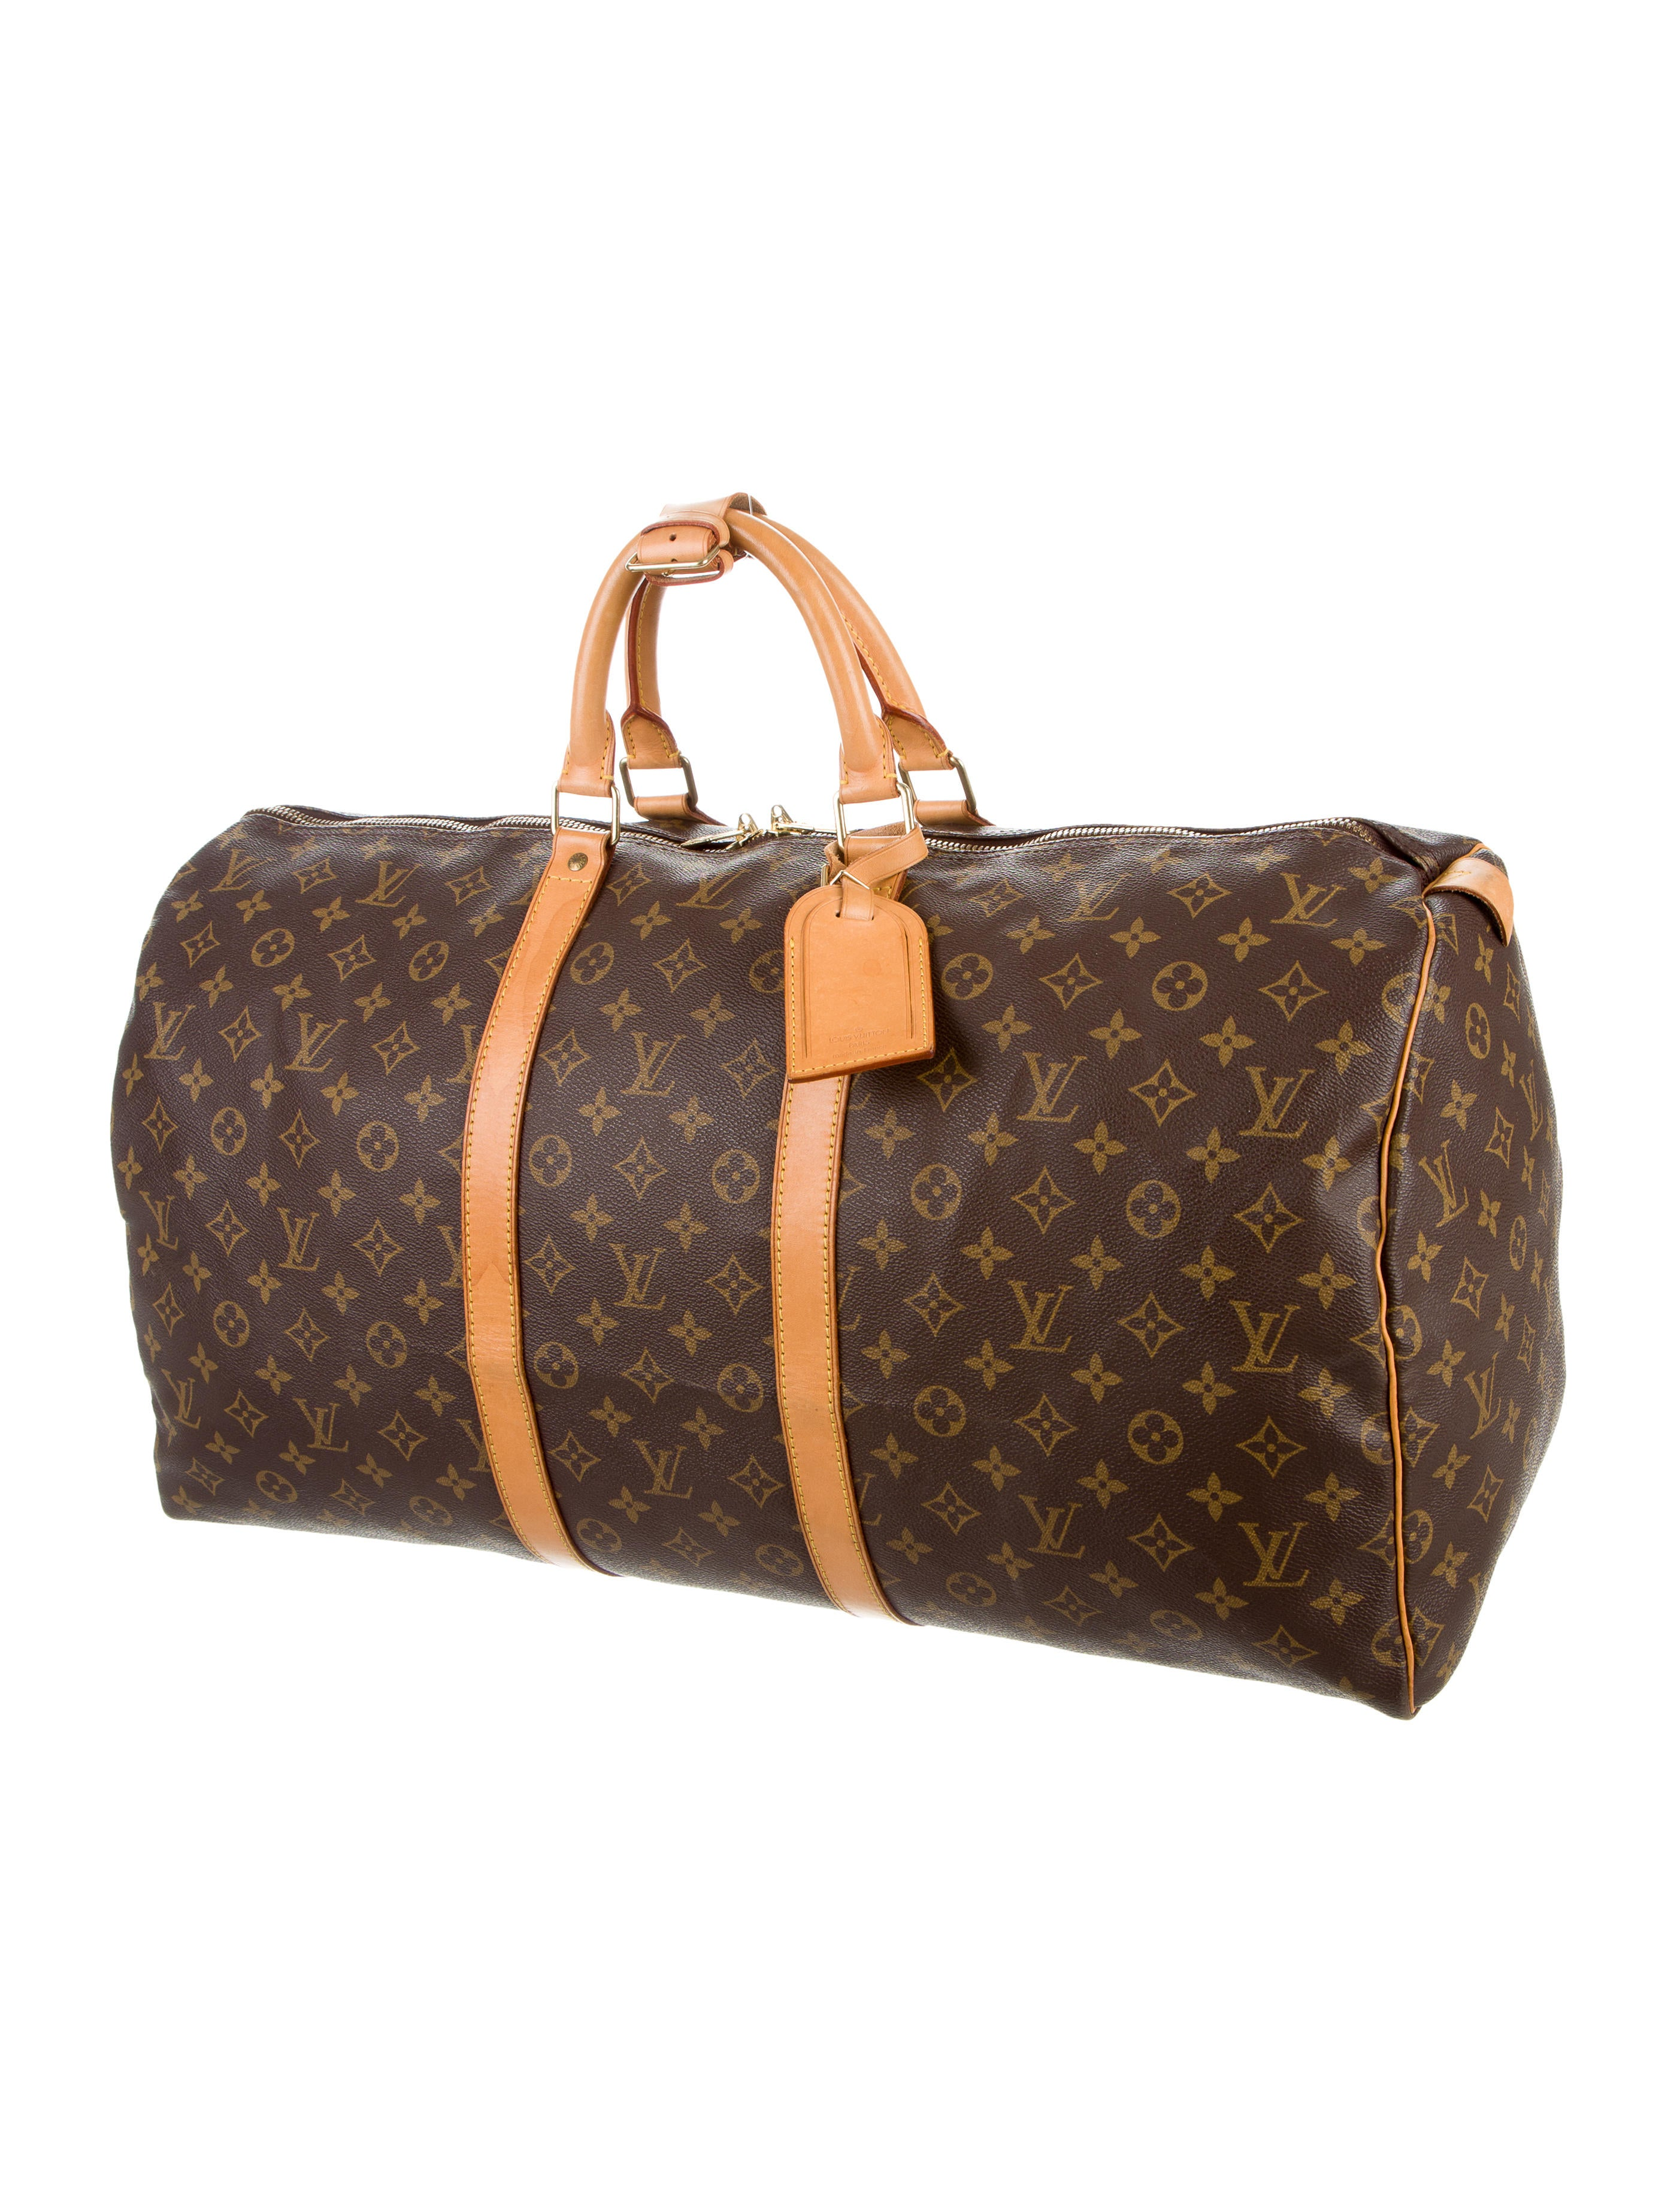 louis vuitton monogram keepall 55 bags lou110610 the realreal. Black Bedroom Furniture Sets. Home Design Ideas